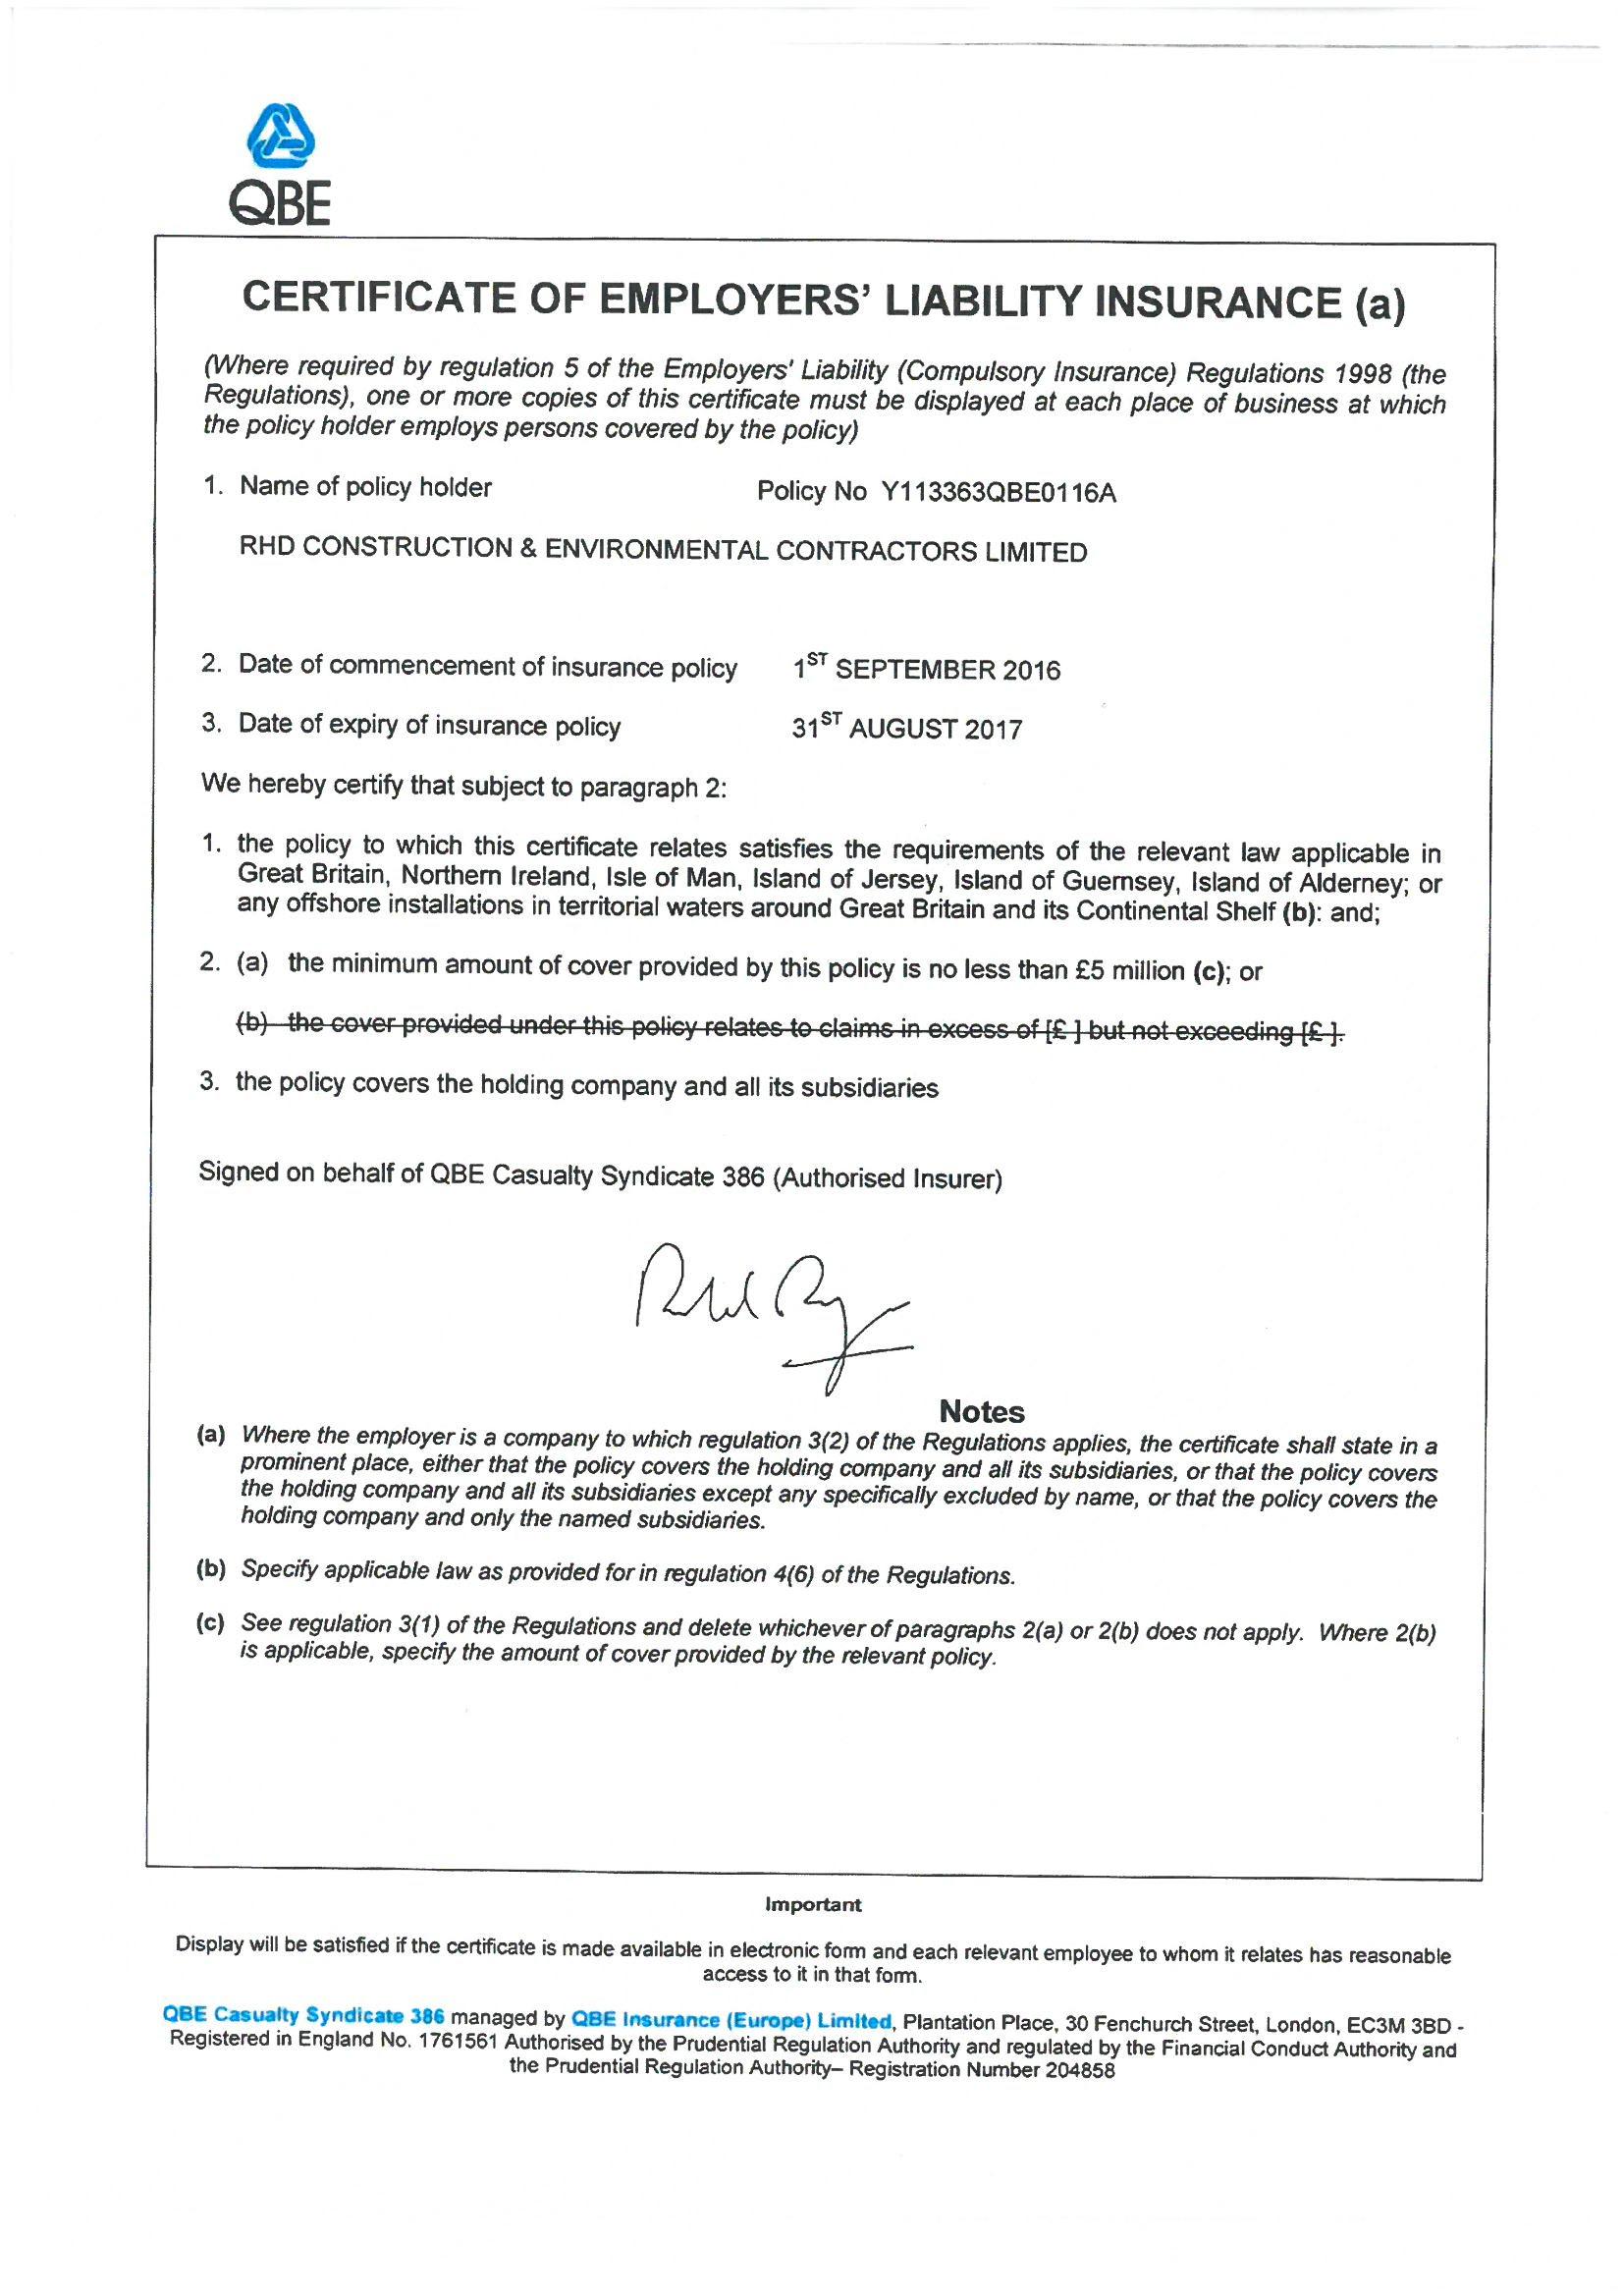 Accreditations | RHD Construction & Environmental ...